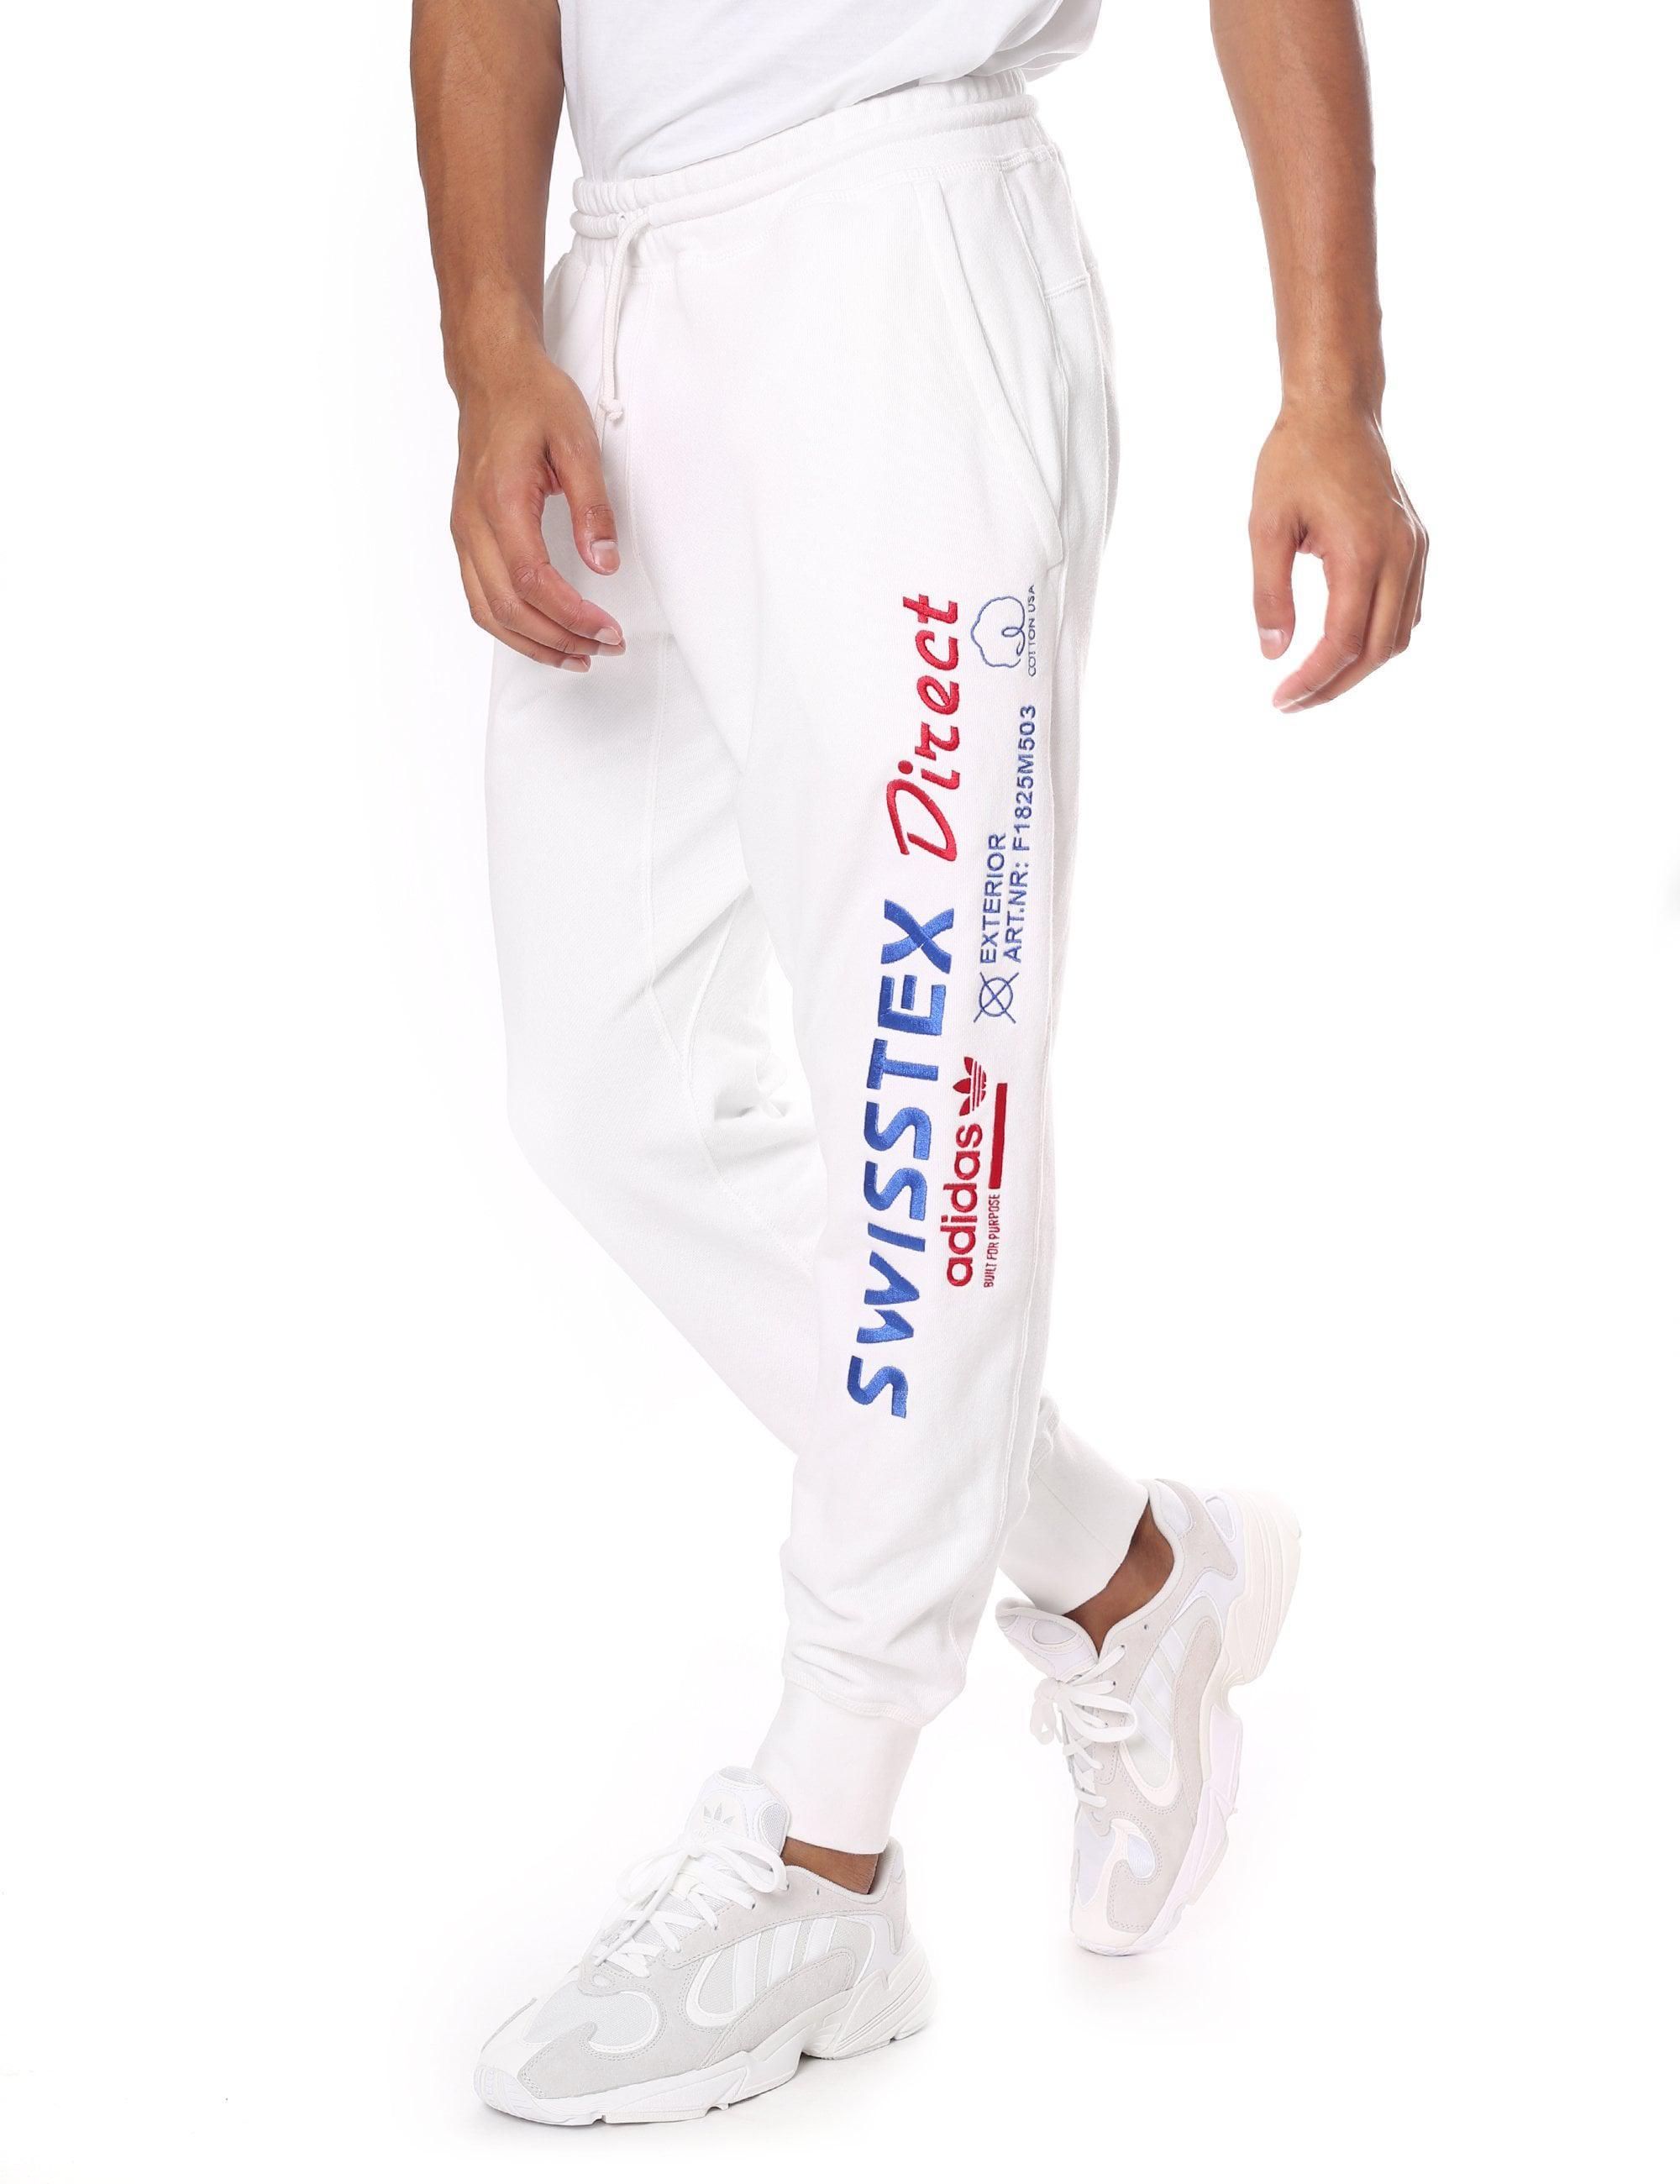 adidas Cotton Men's Kaval Sweat Pant in Cloud White (White